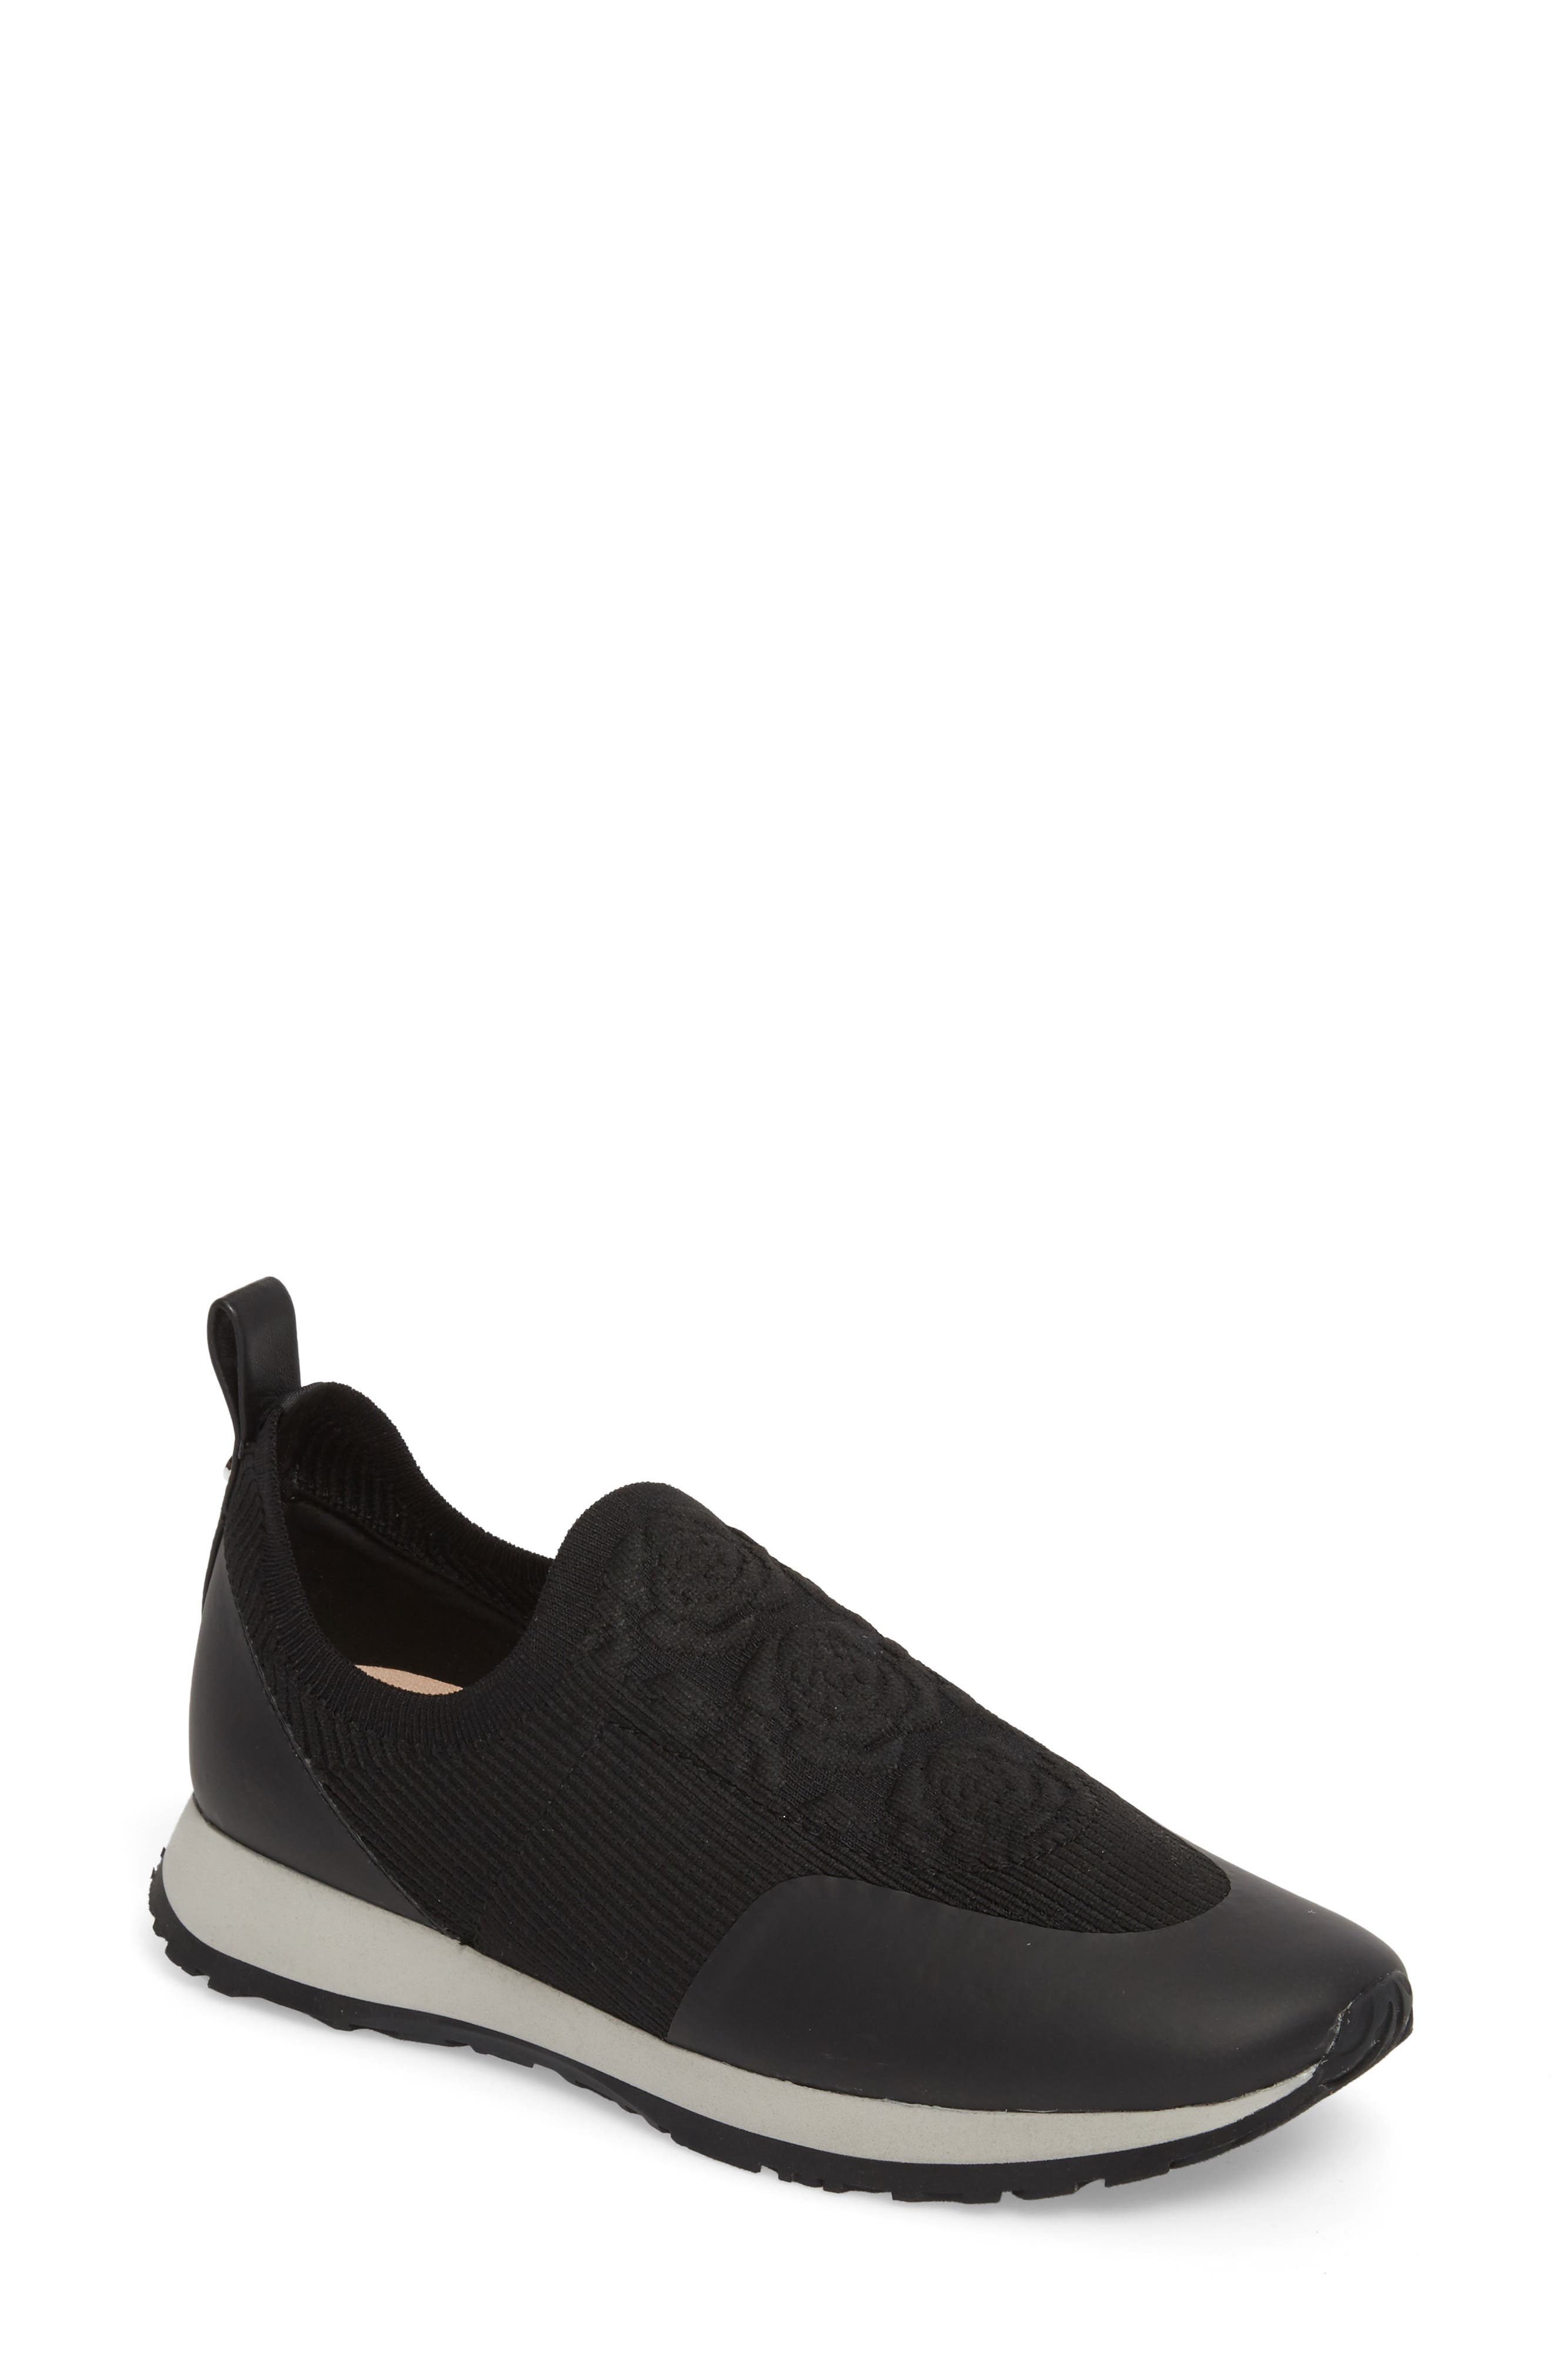 Cara Slip-On Sneaker,                         Main,                         color, 001